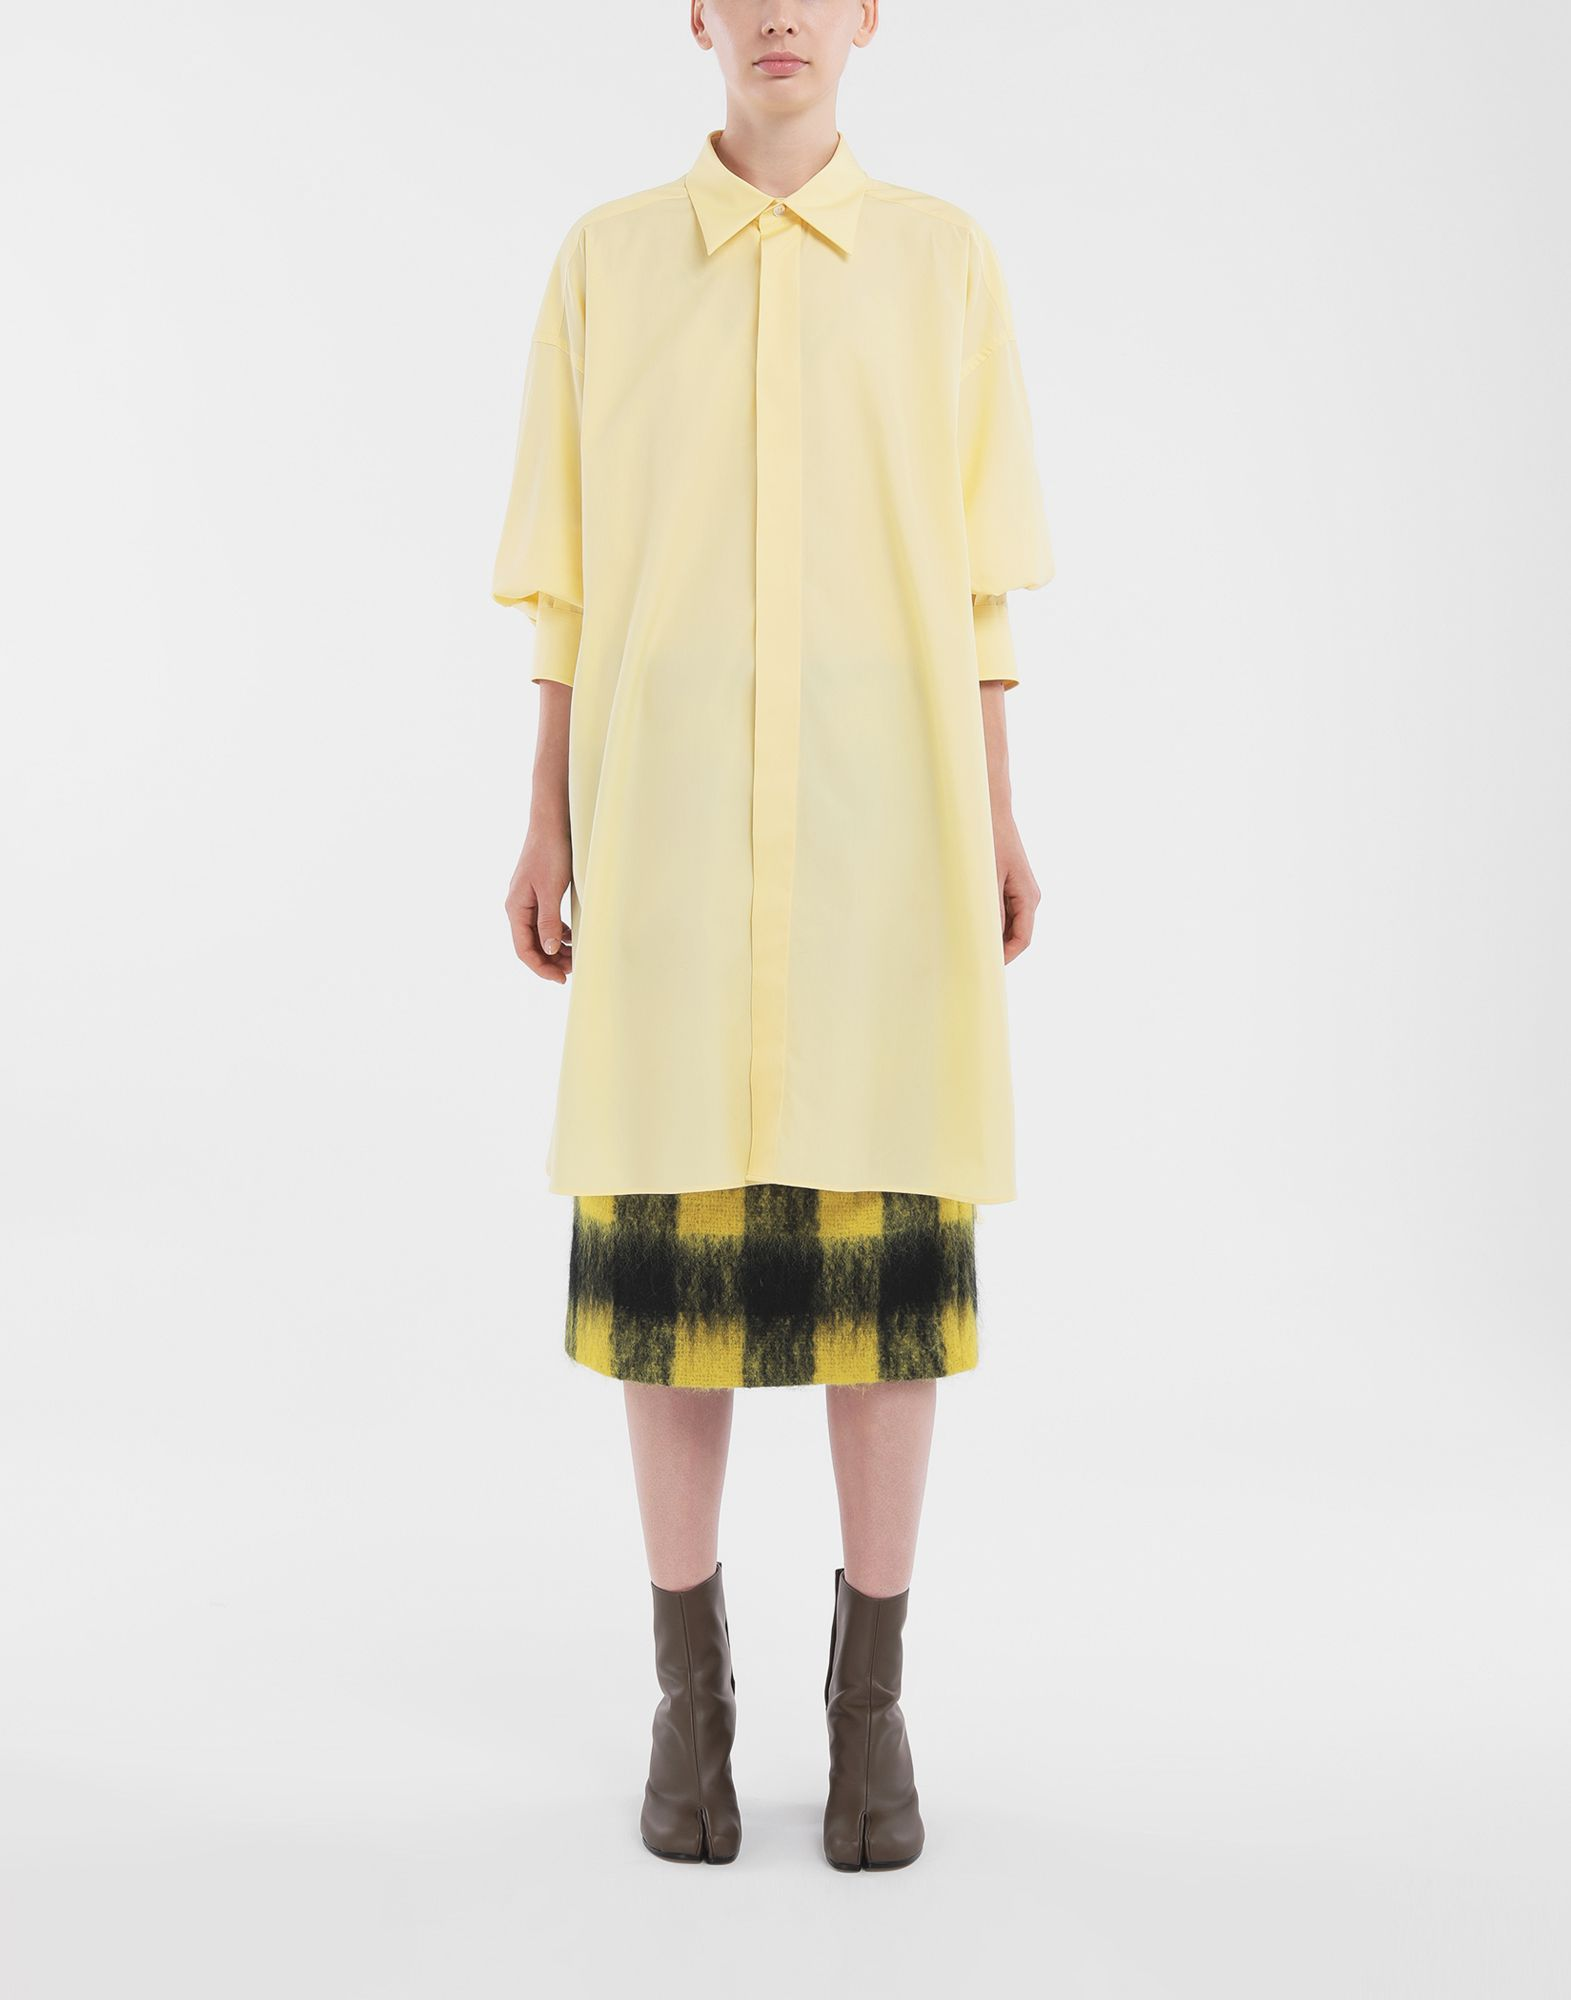 MAISON MARGIELA Mohair check skirt Skirt Woman d